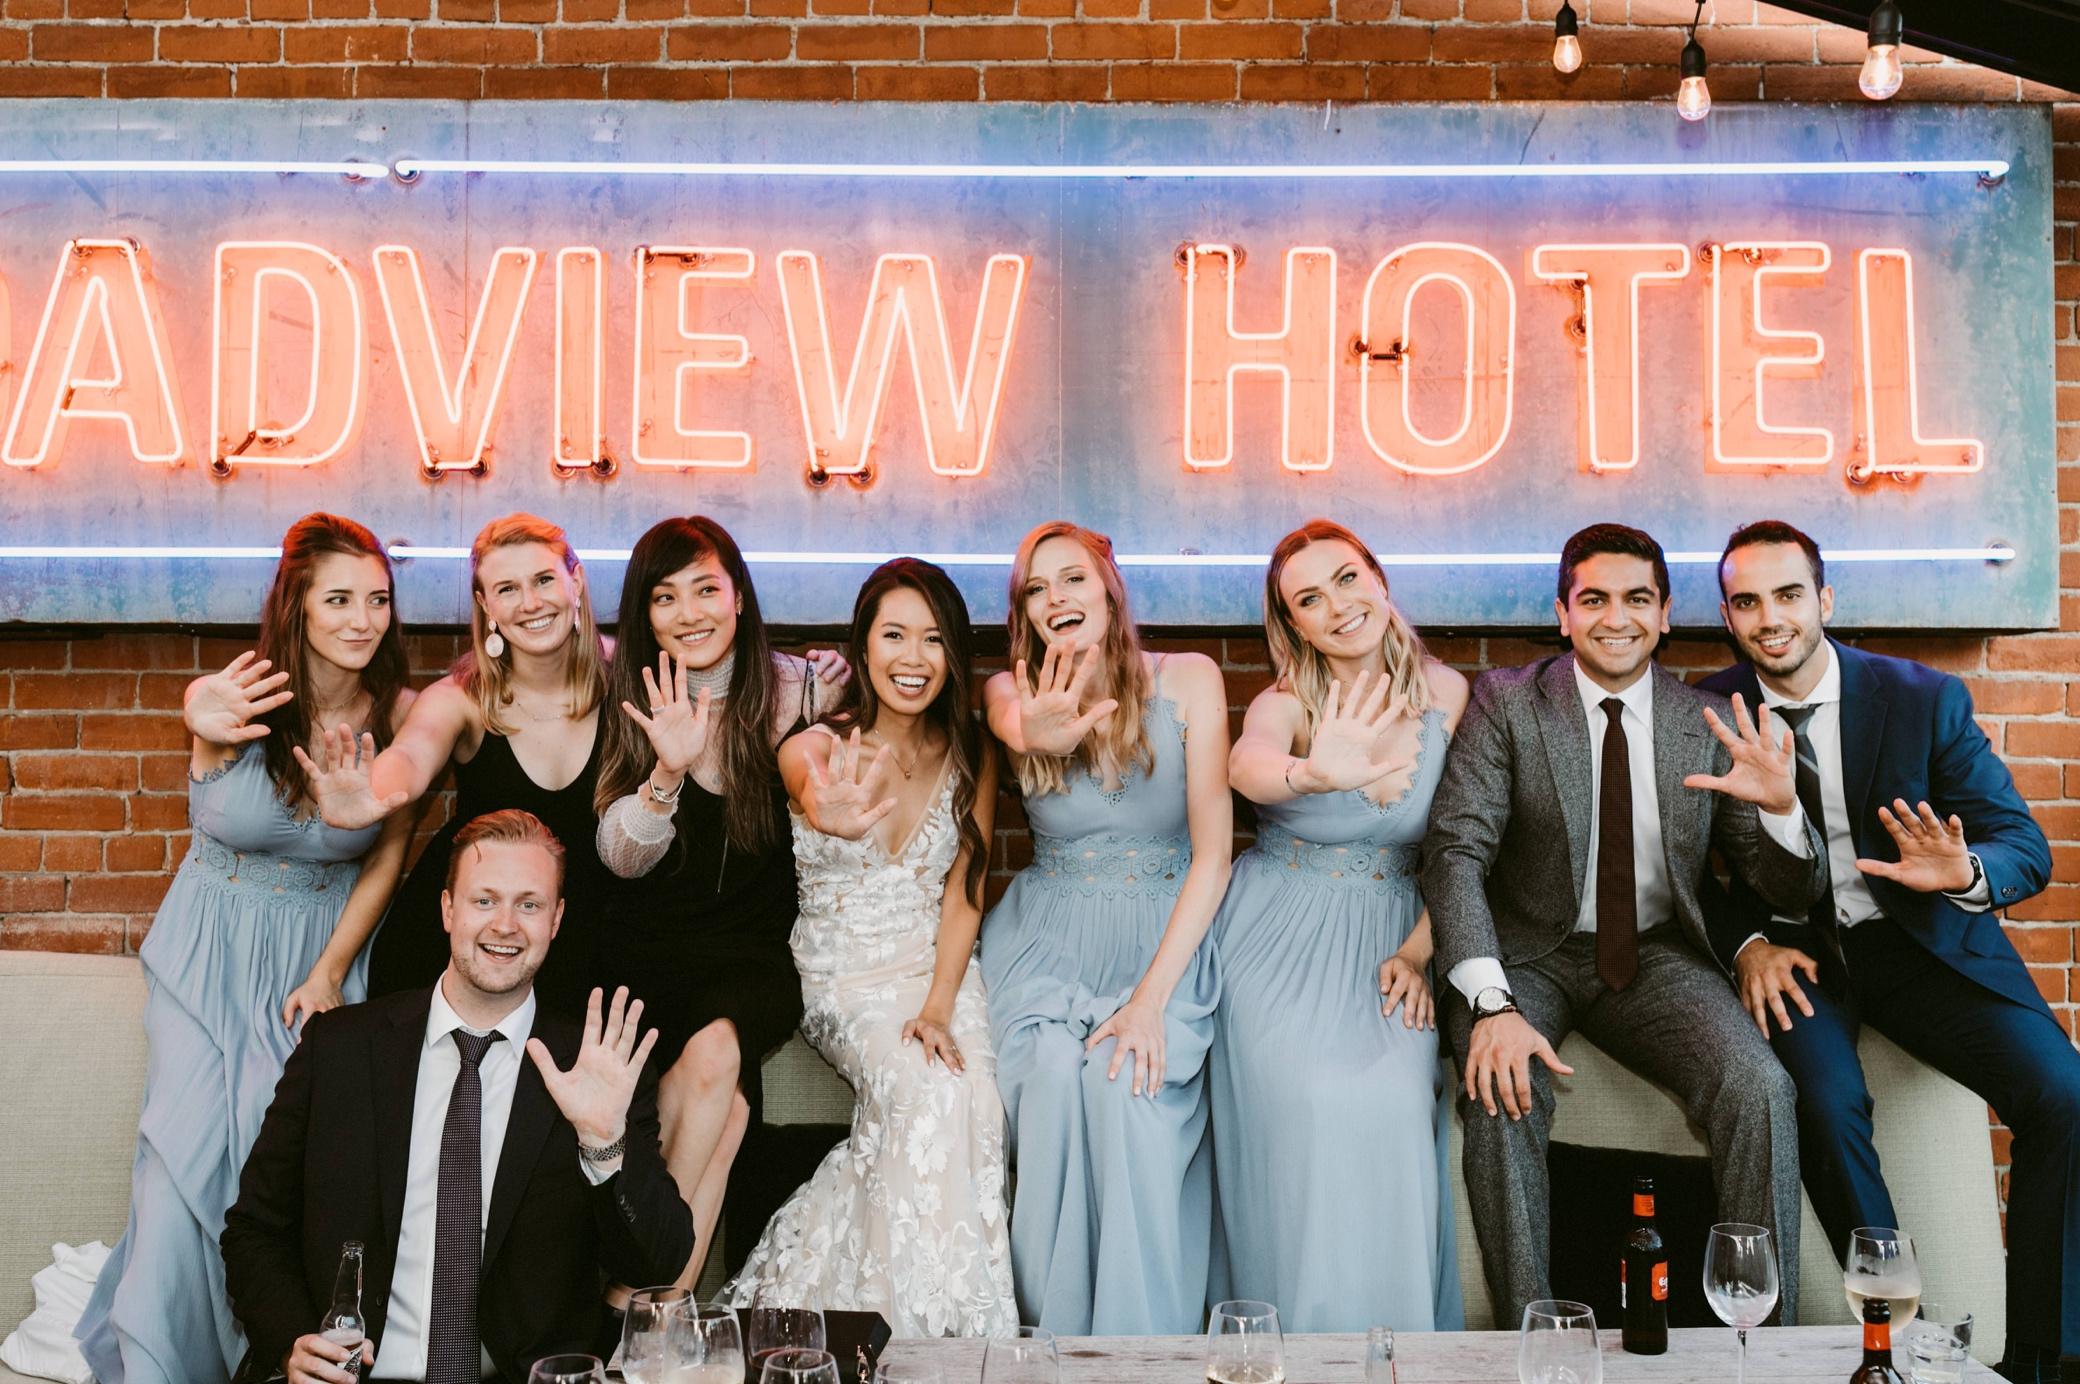 083_The Broadview Hotel Wedding (580 of 913)_Broadview_Hotel_City_Toronto_Wedding.jpg